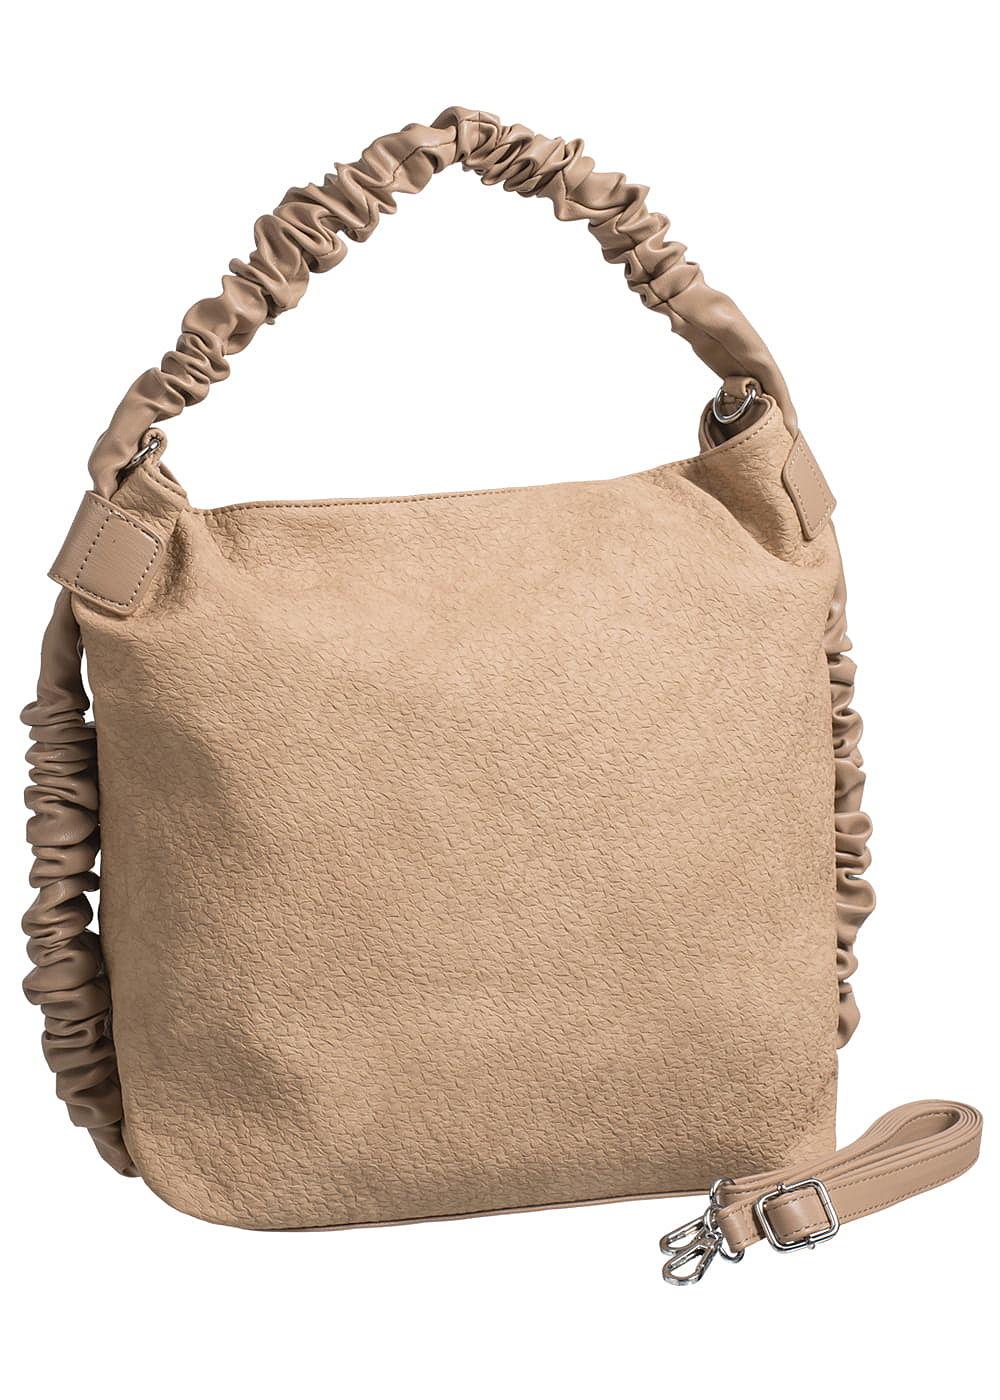 seventyseven lifestyle damen handtasche breite 41cm h he. Black Bedroom Furniture Sets. Home Design Ideas